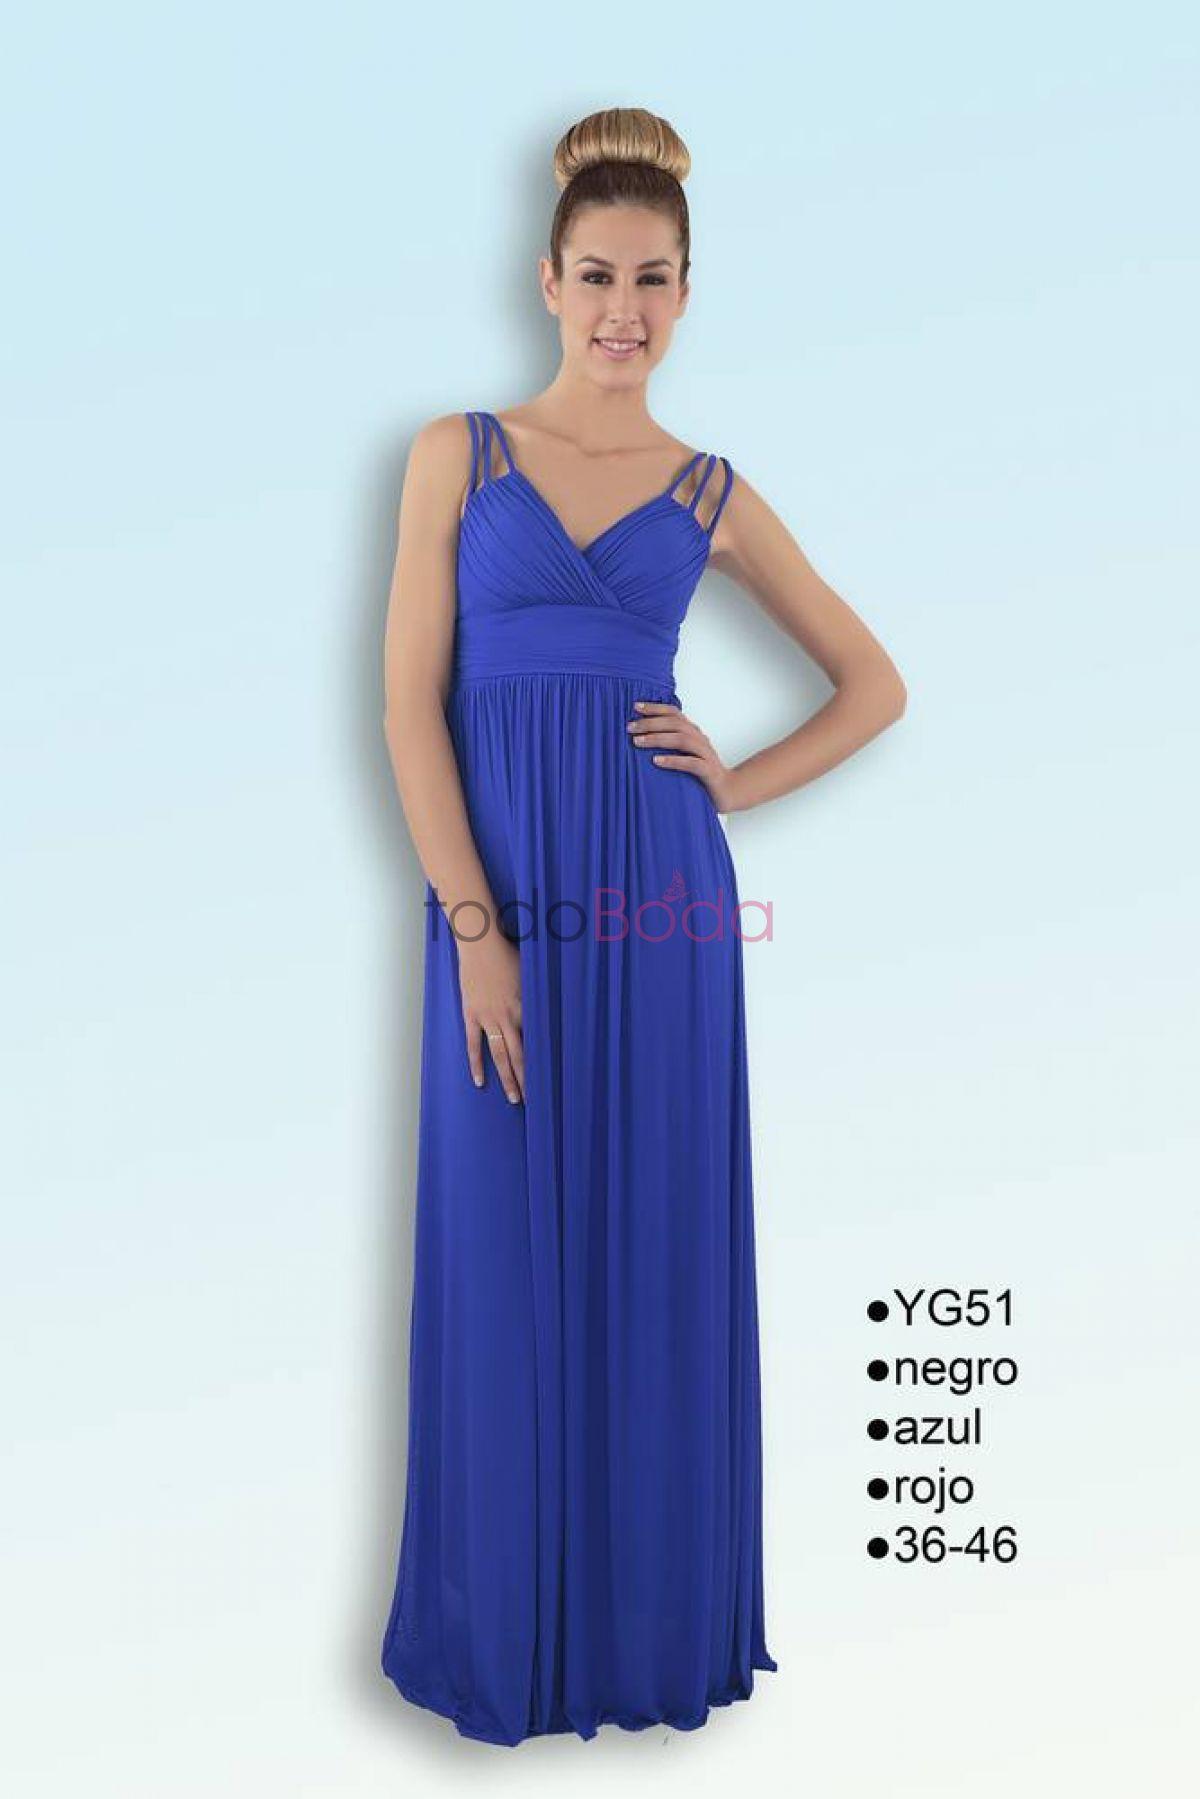 333fc5395 Tu boda en Rosa Azul Plenilunio